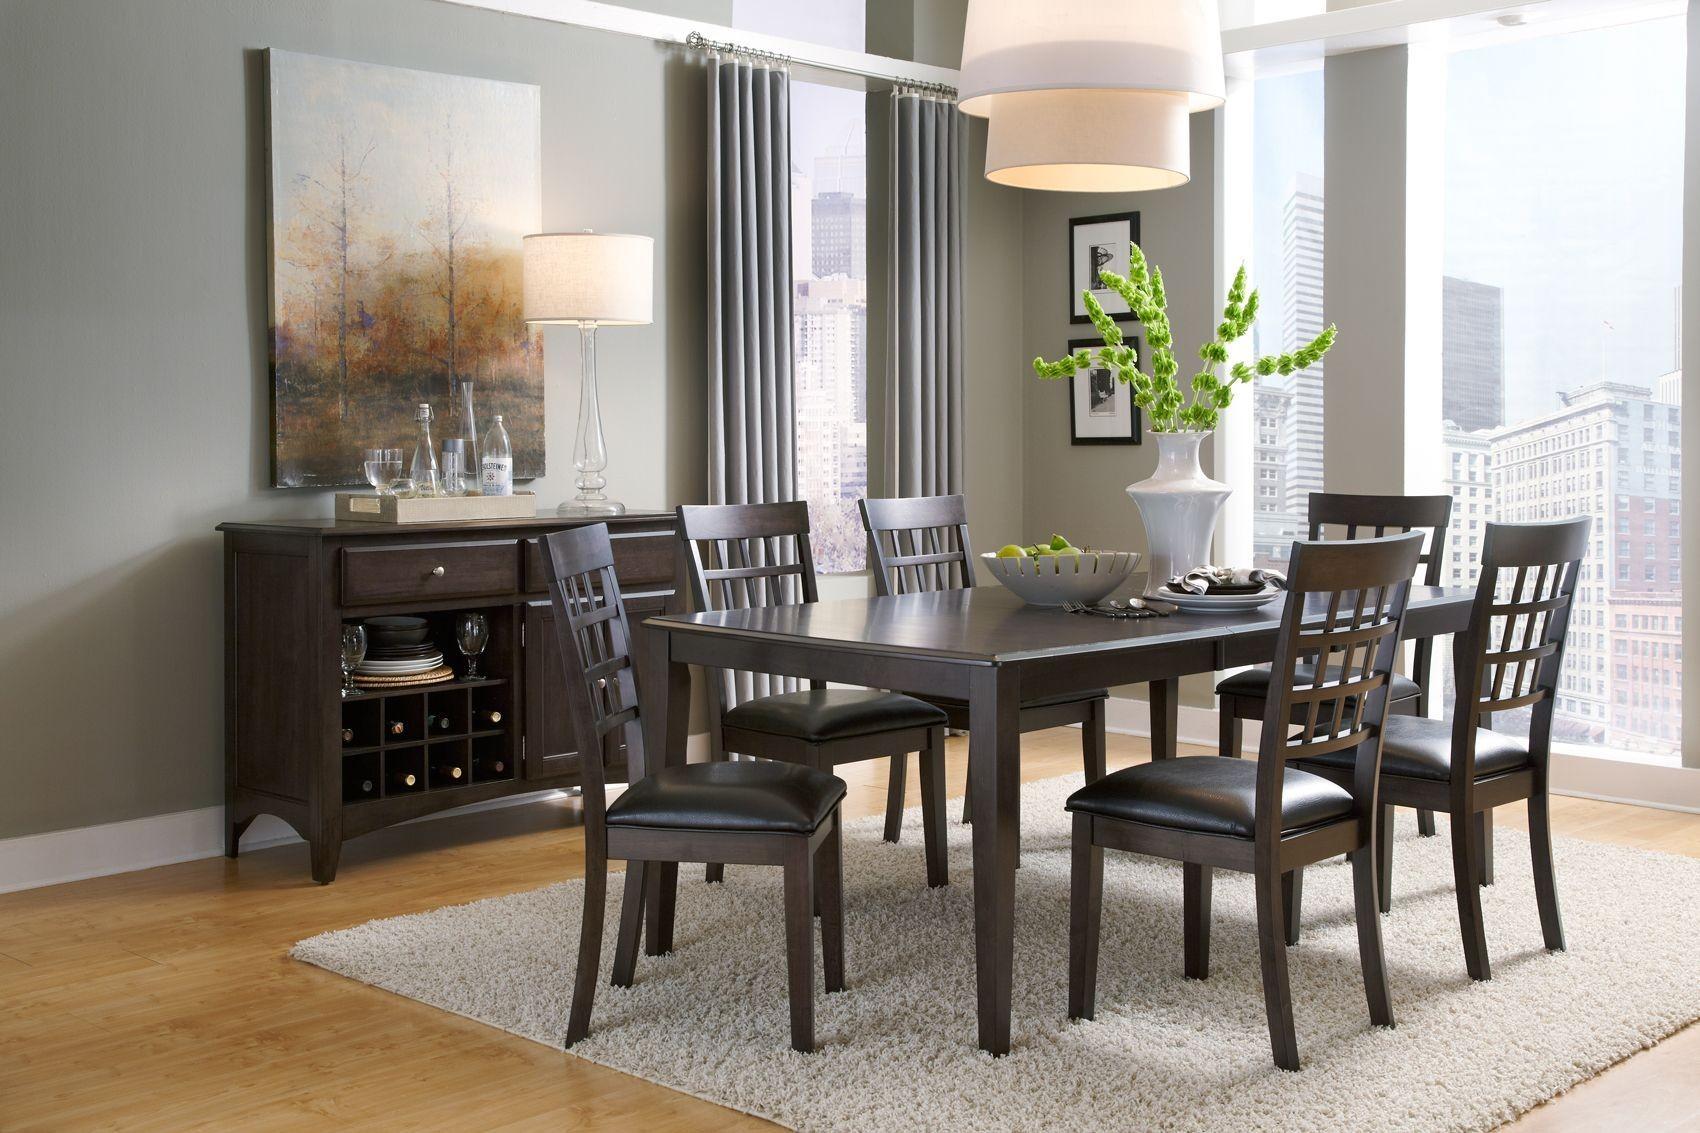 bristol point 78 warm grey extendable rectangular dining. Black Bedroom Furniture Sets. Home Design Ideas